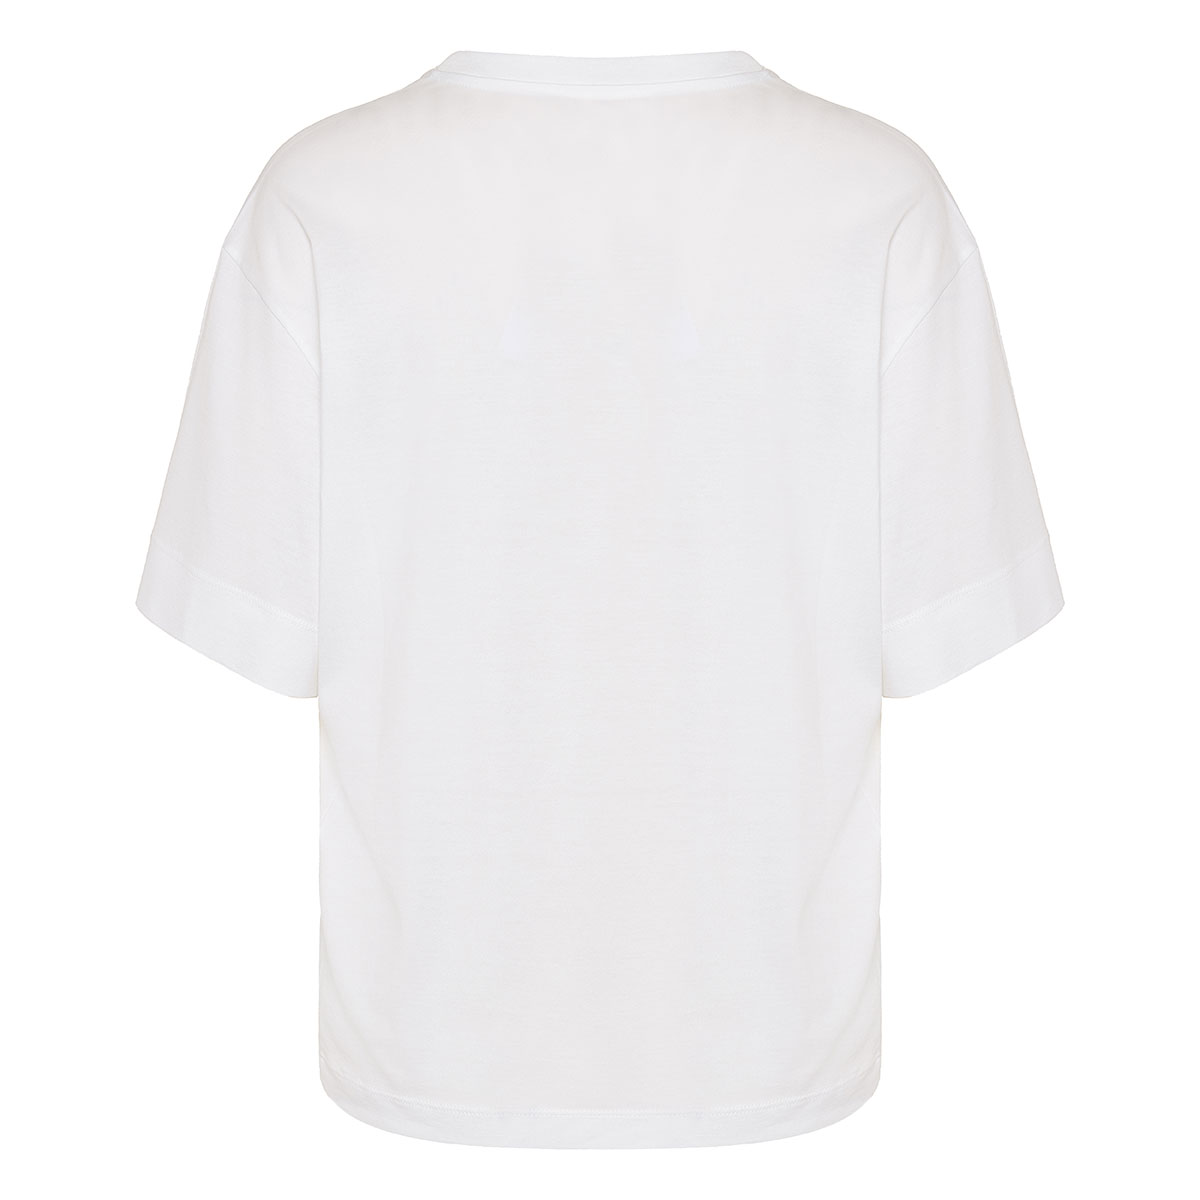 Femininity logo oversized t-shirt